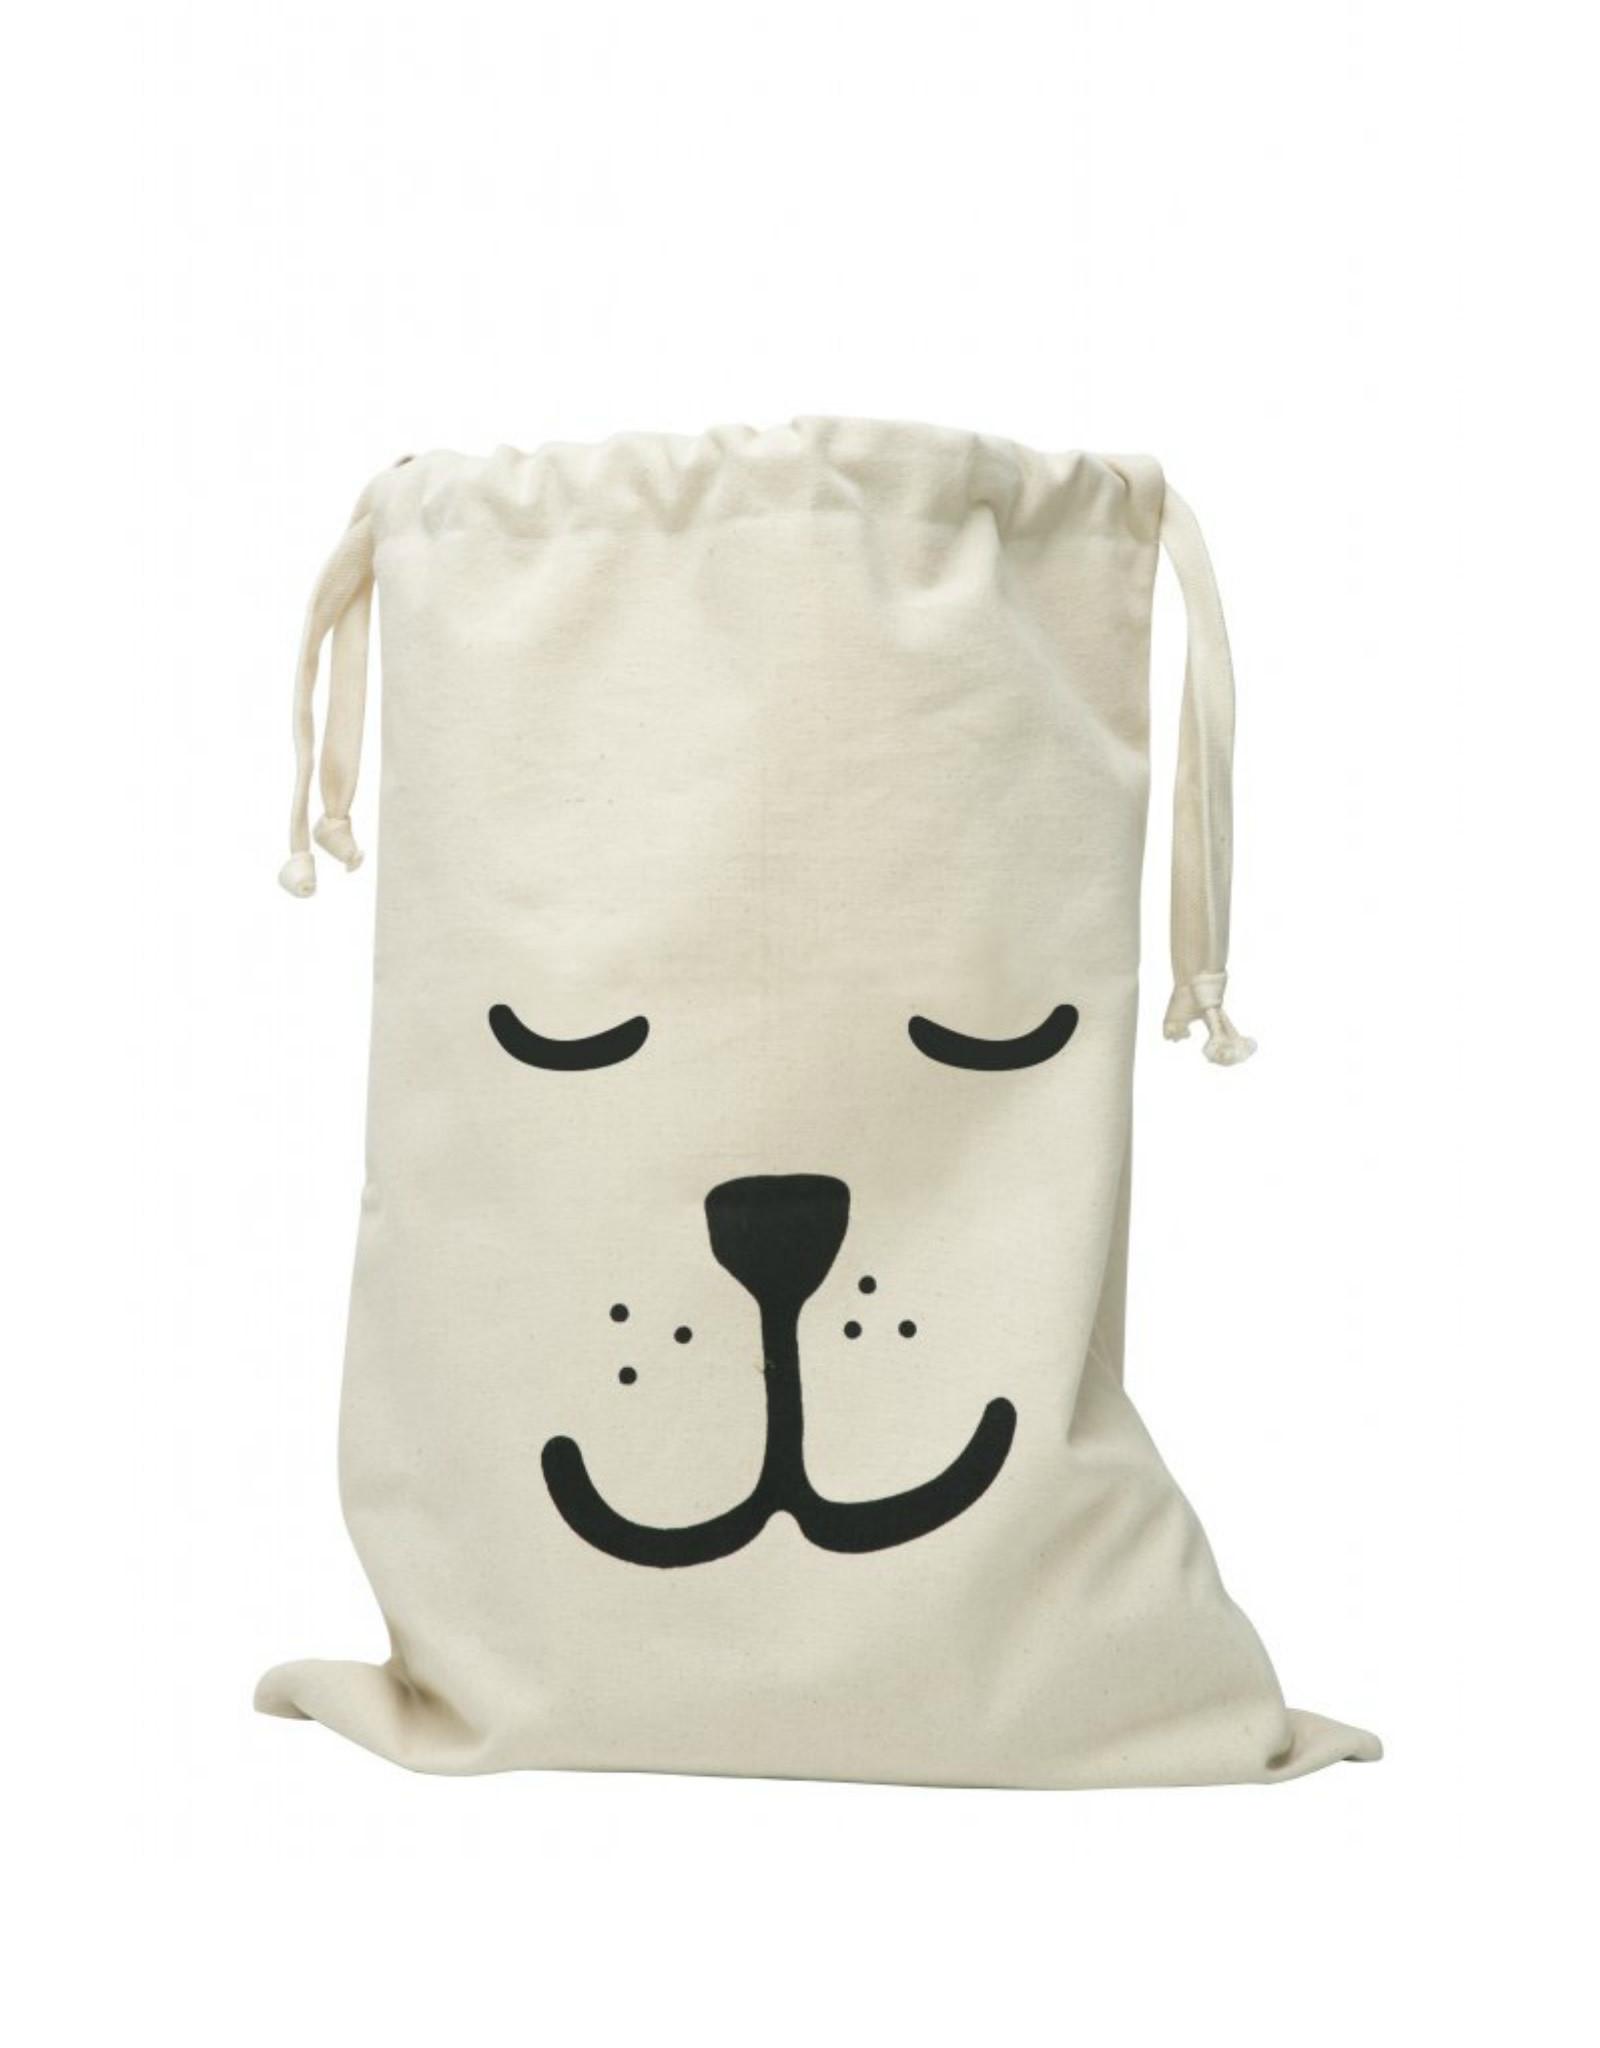 Tellkiddo Storage fabric bag - Sleeping bear